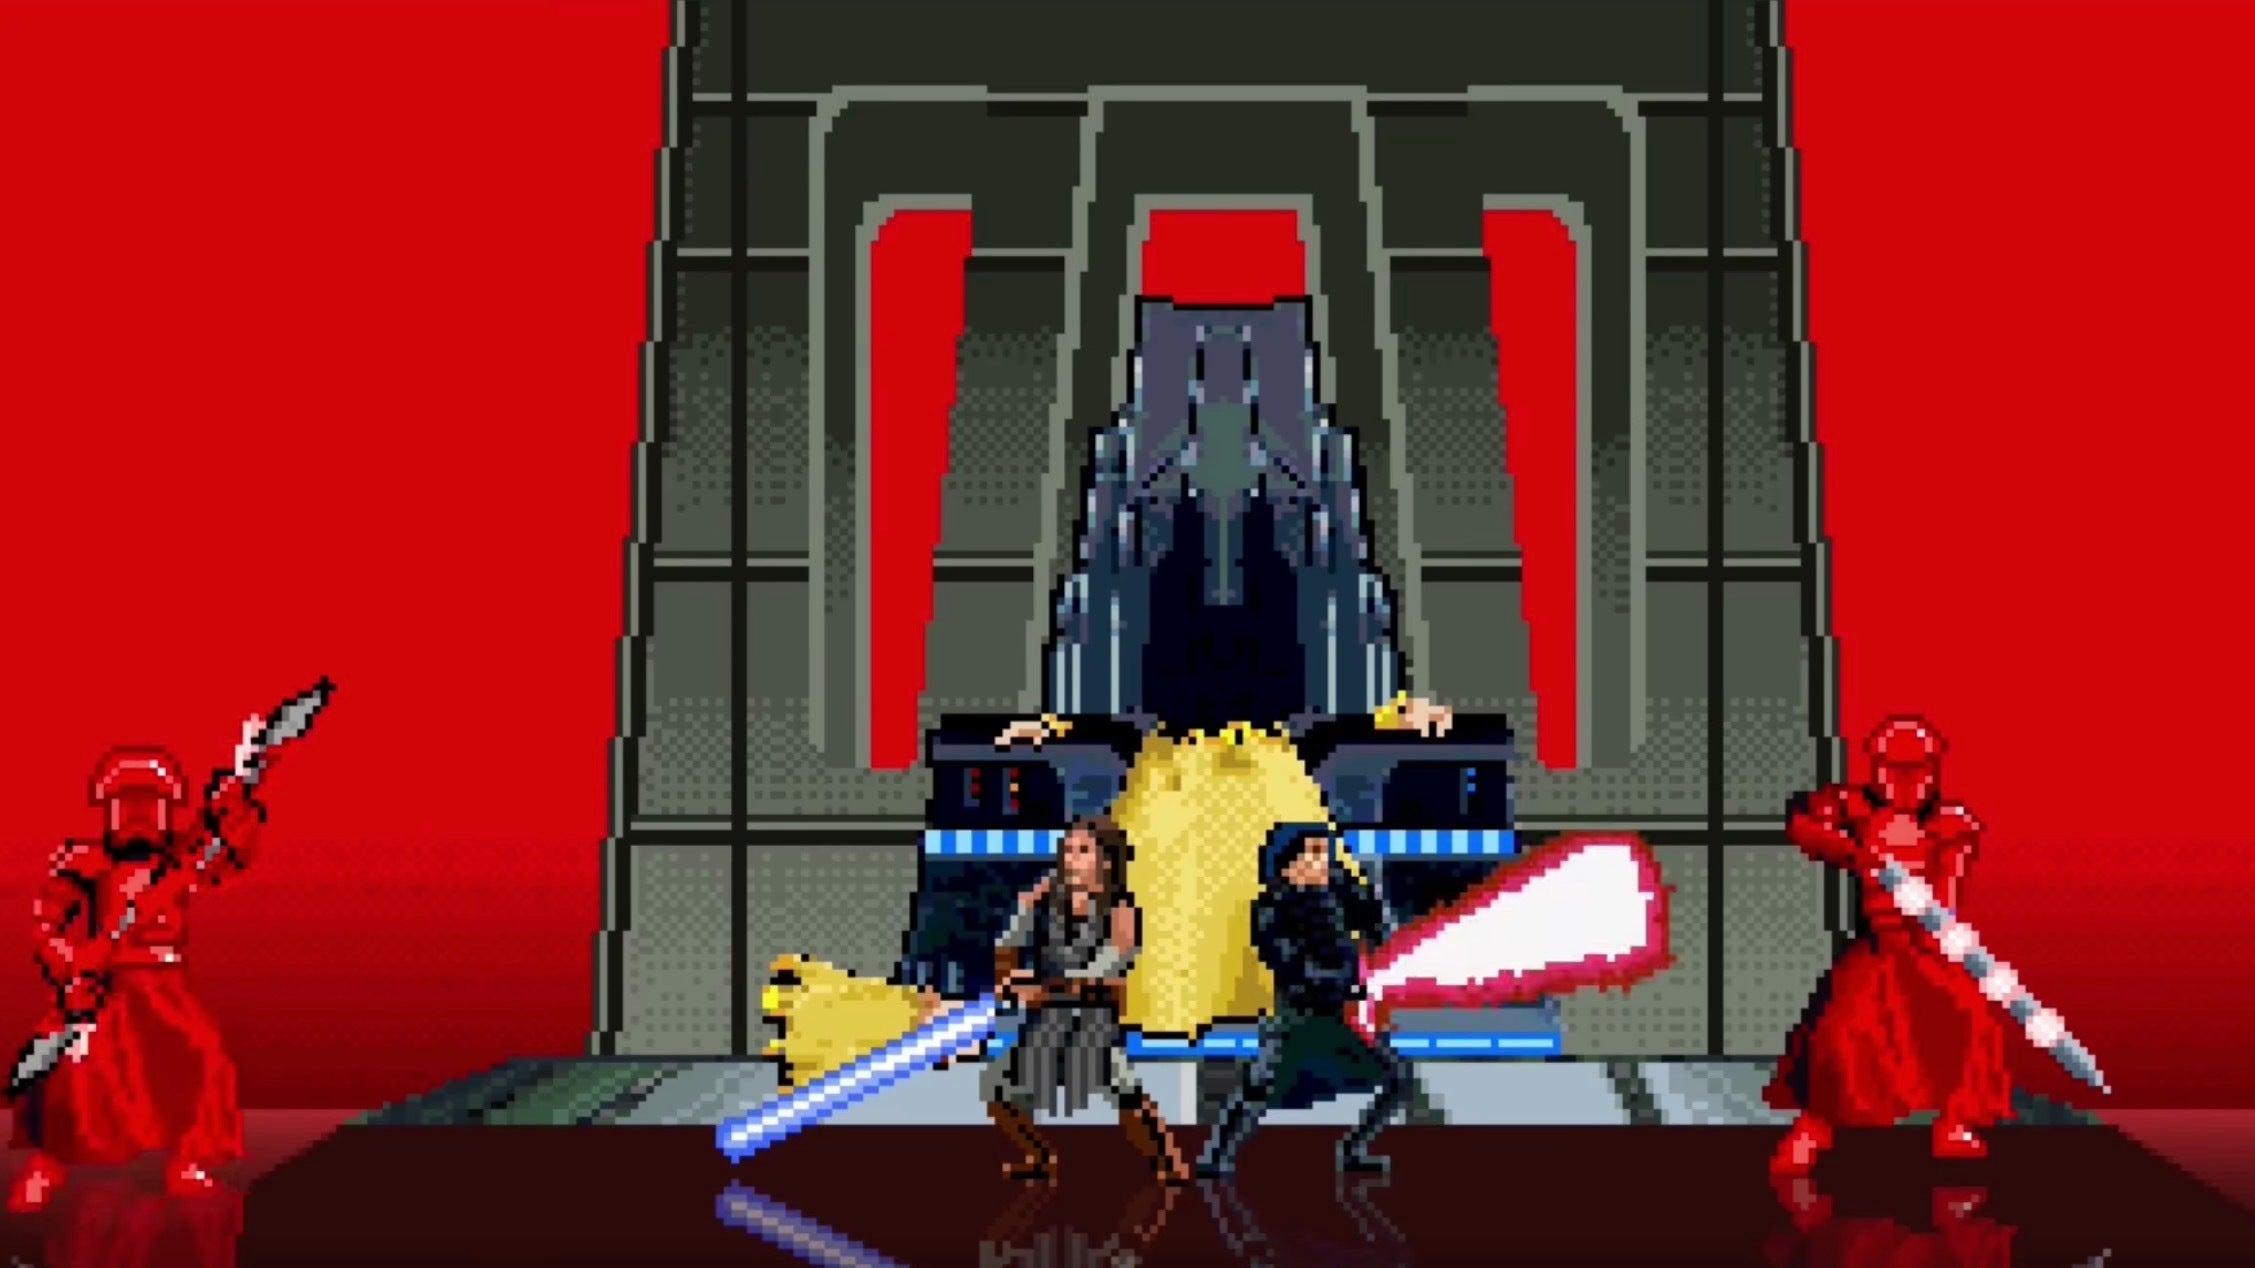 Even In 16 Bits, The Throne Room Scene From The Last Jedi Still Rules